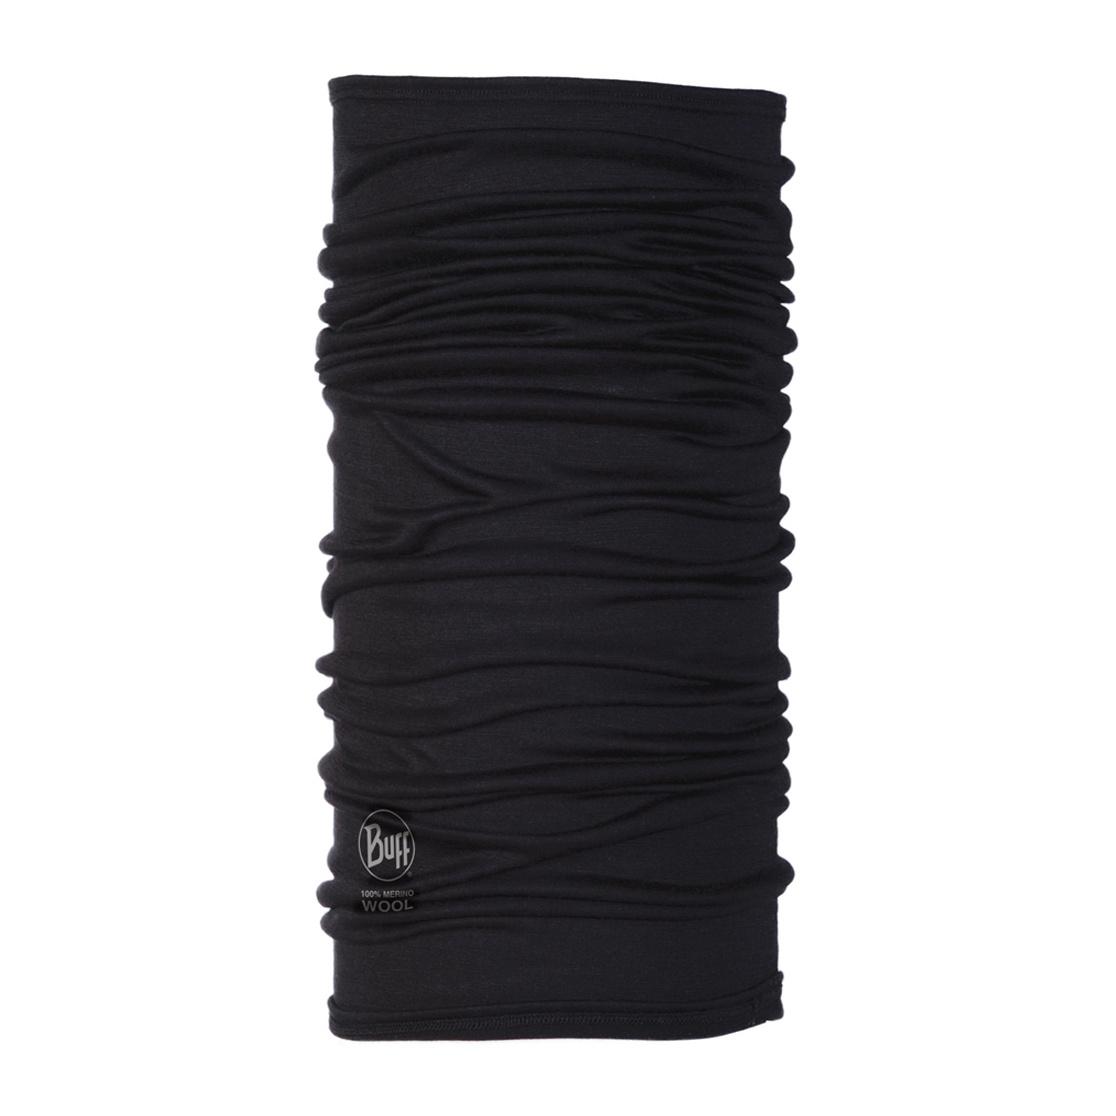 BUFF Lightweight Merino Wool Buff, Black